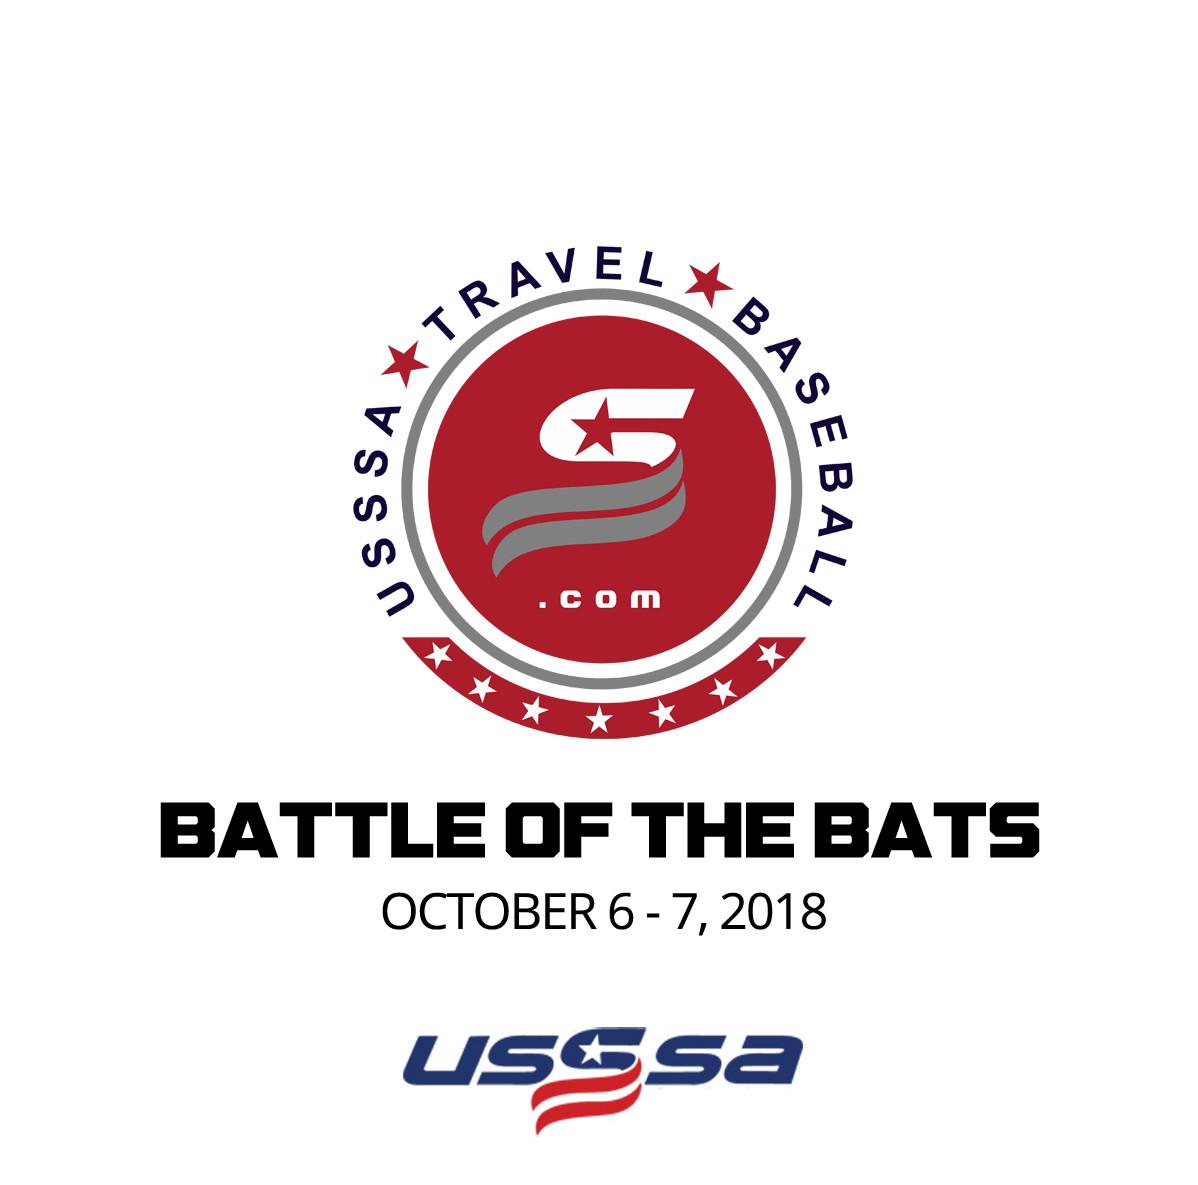 1516d595630 South Carolina - Travel Baseball Showcase   Tournaments